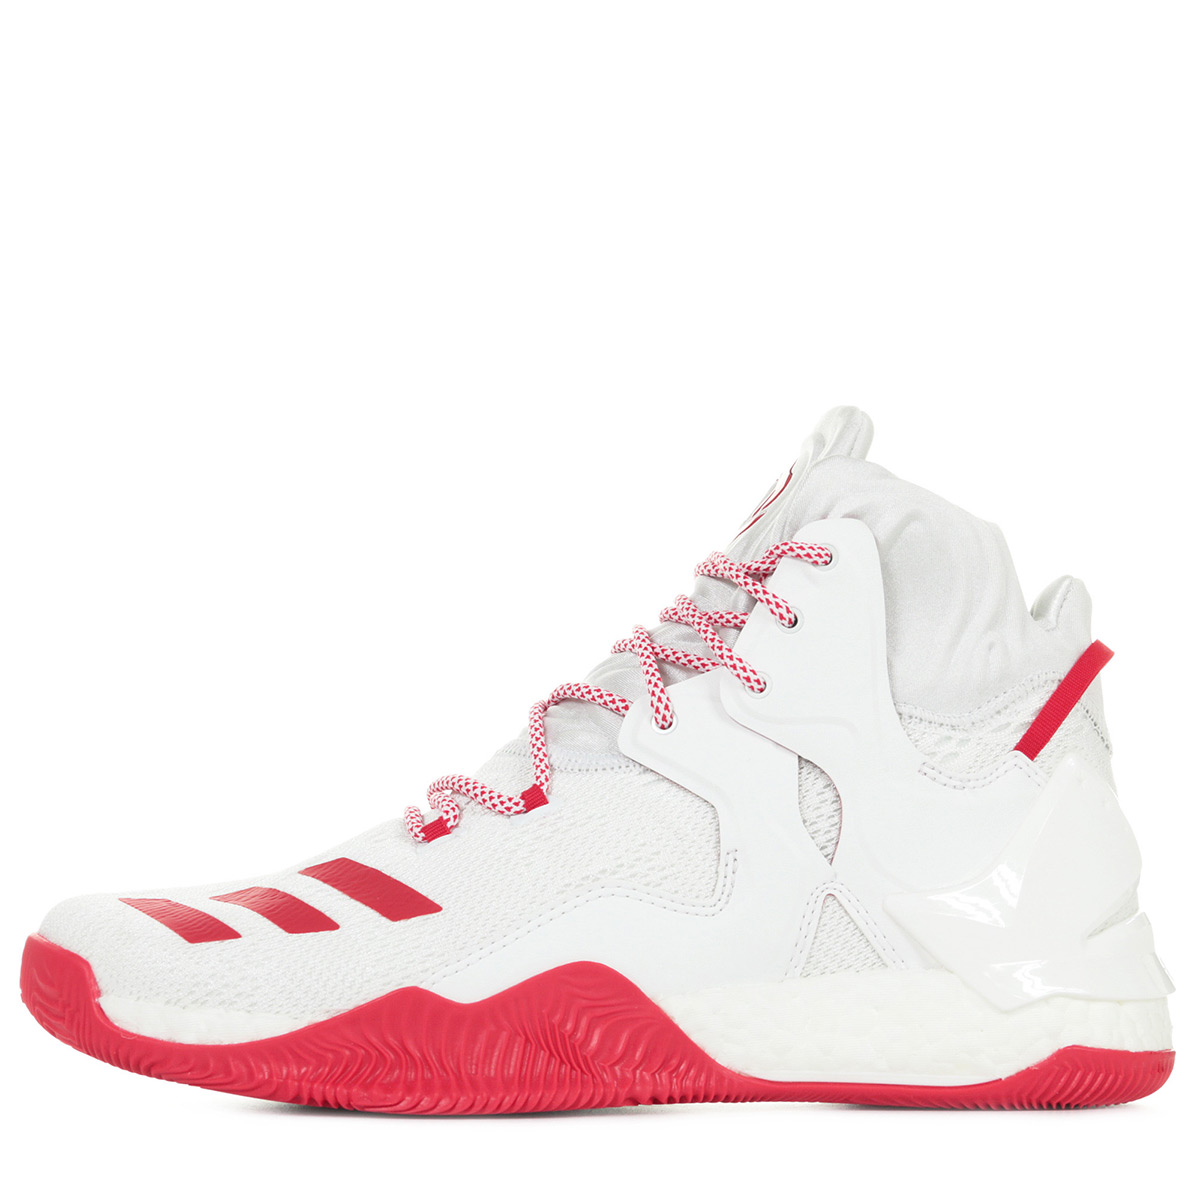 Détails sur Chaussures adidas Performance homme D Rose 7 Basketball taille Blanc Blanche